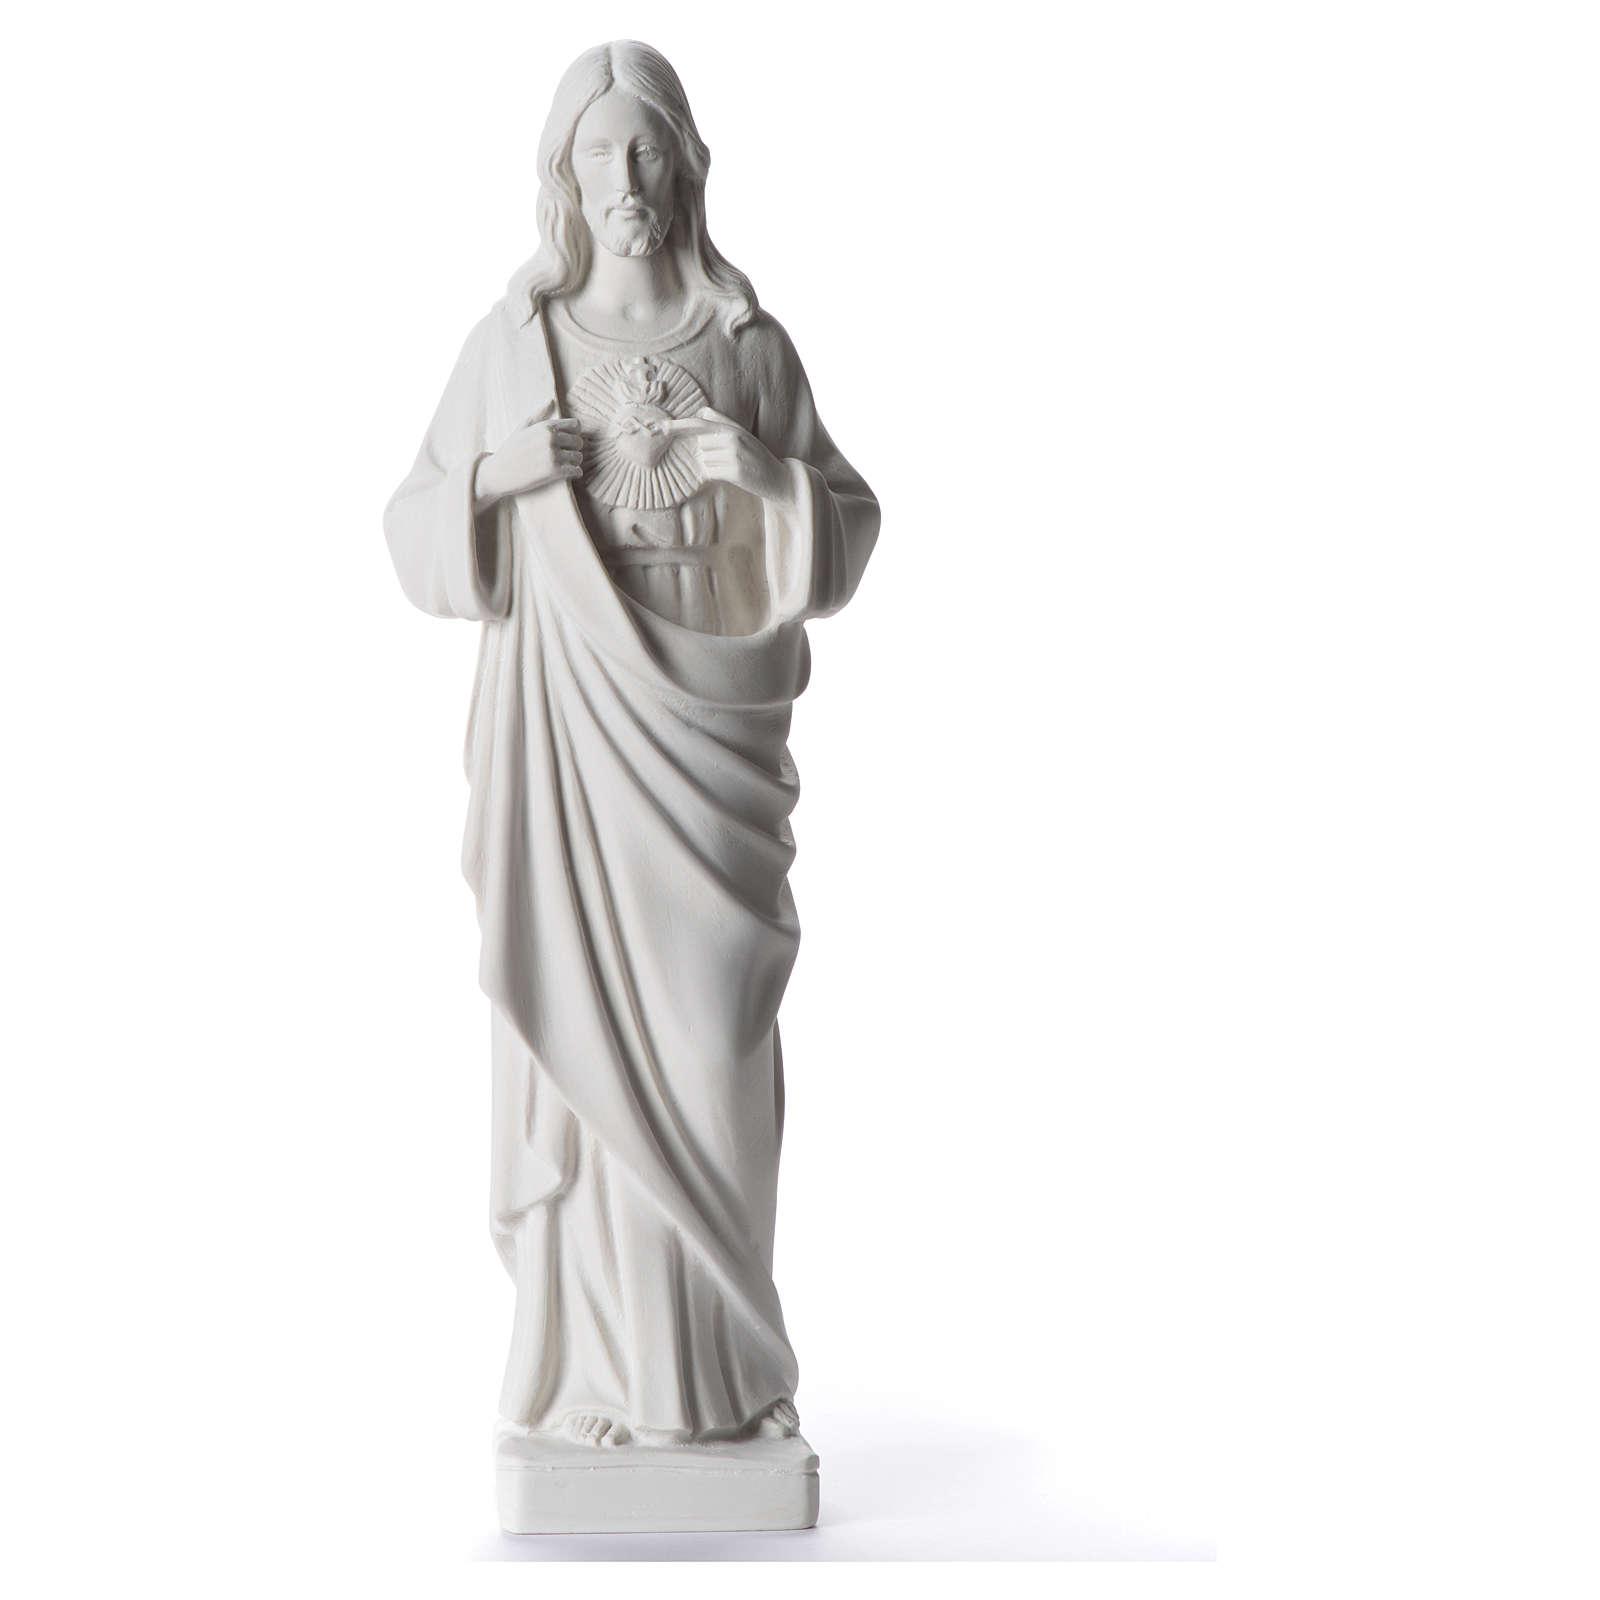 Sagrado Corazón de Jesús 38-53 cm polvo de mármol blanco 38 cm 4